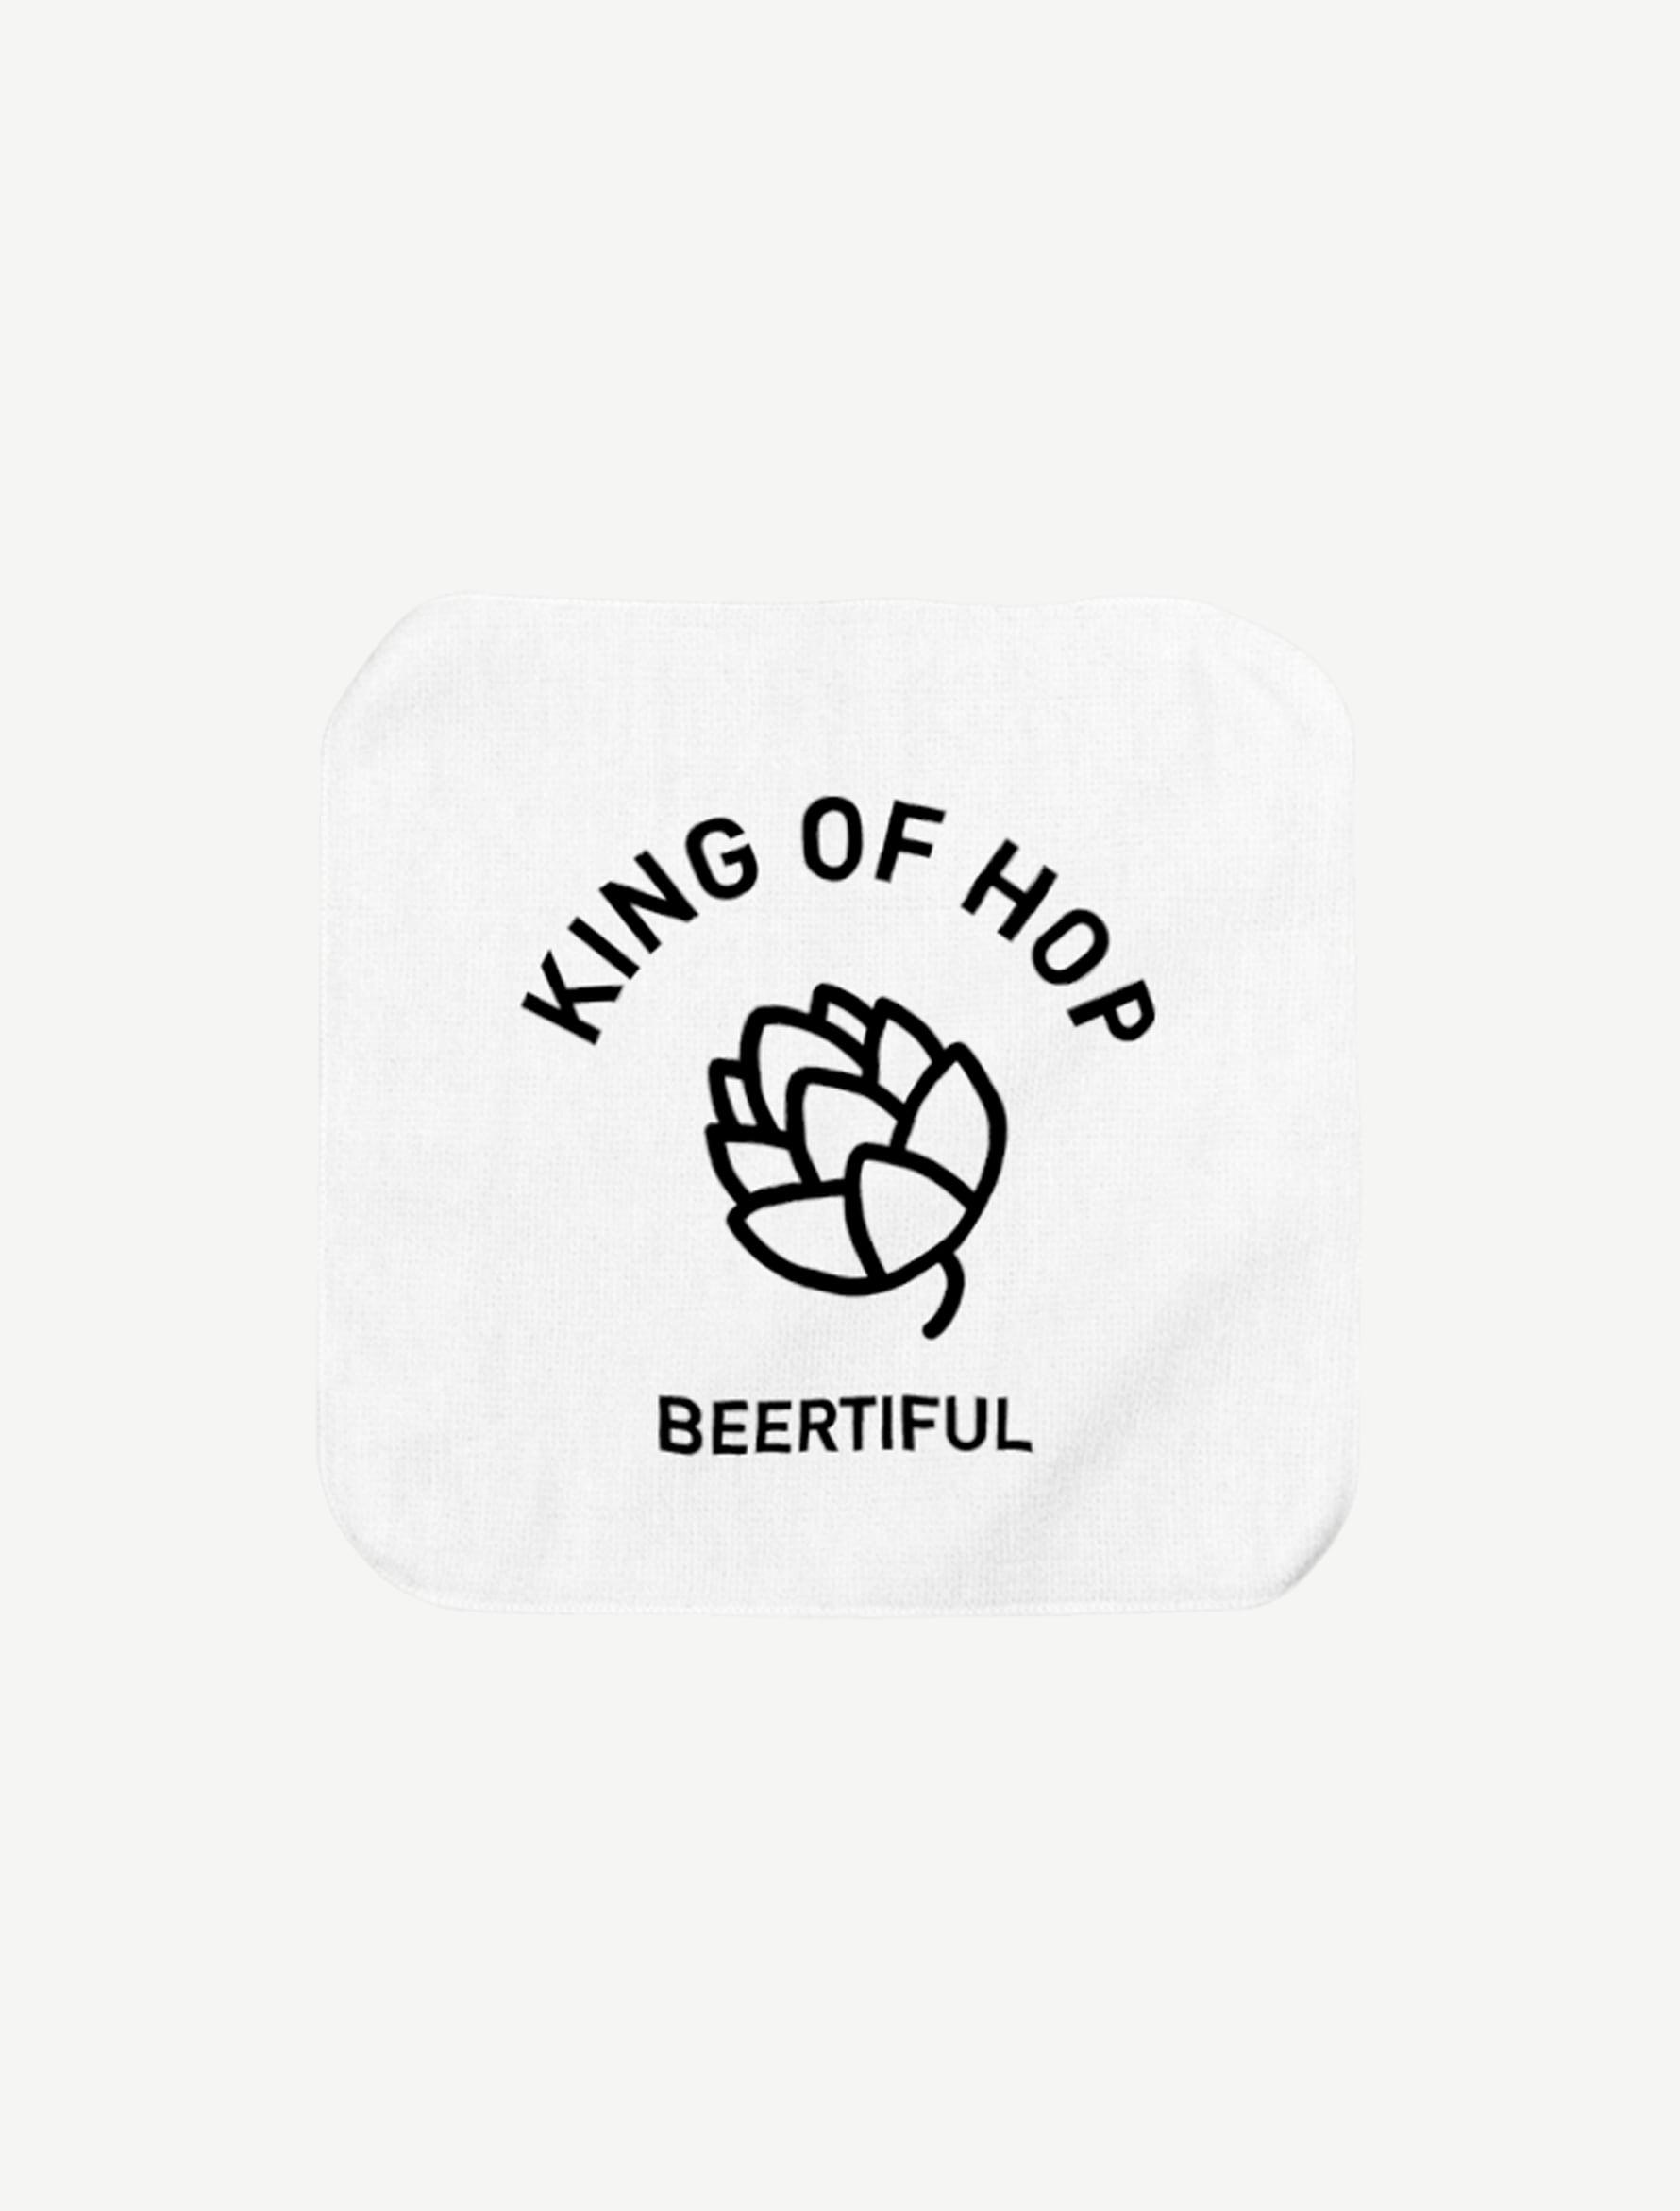 【KING OF HOP】タオルハンカチ(Sサイズ)